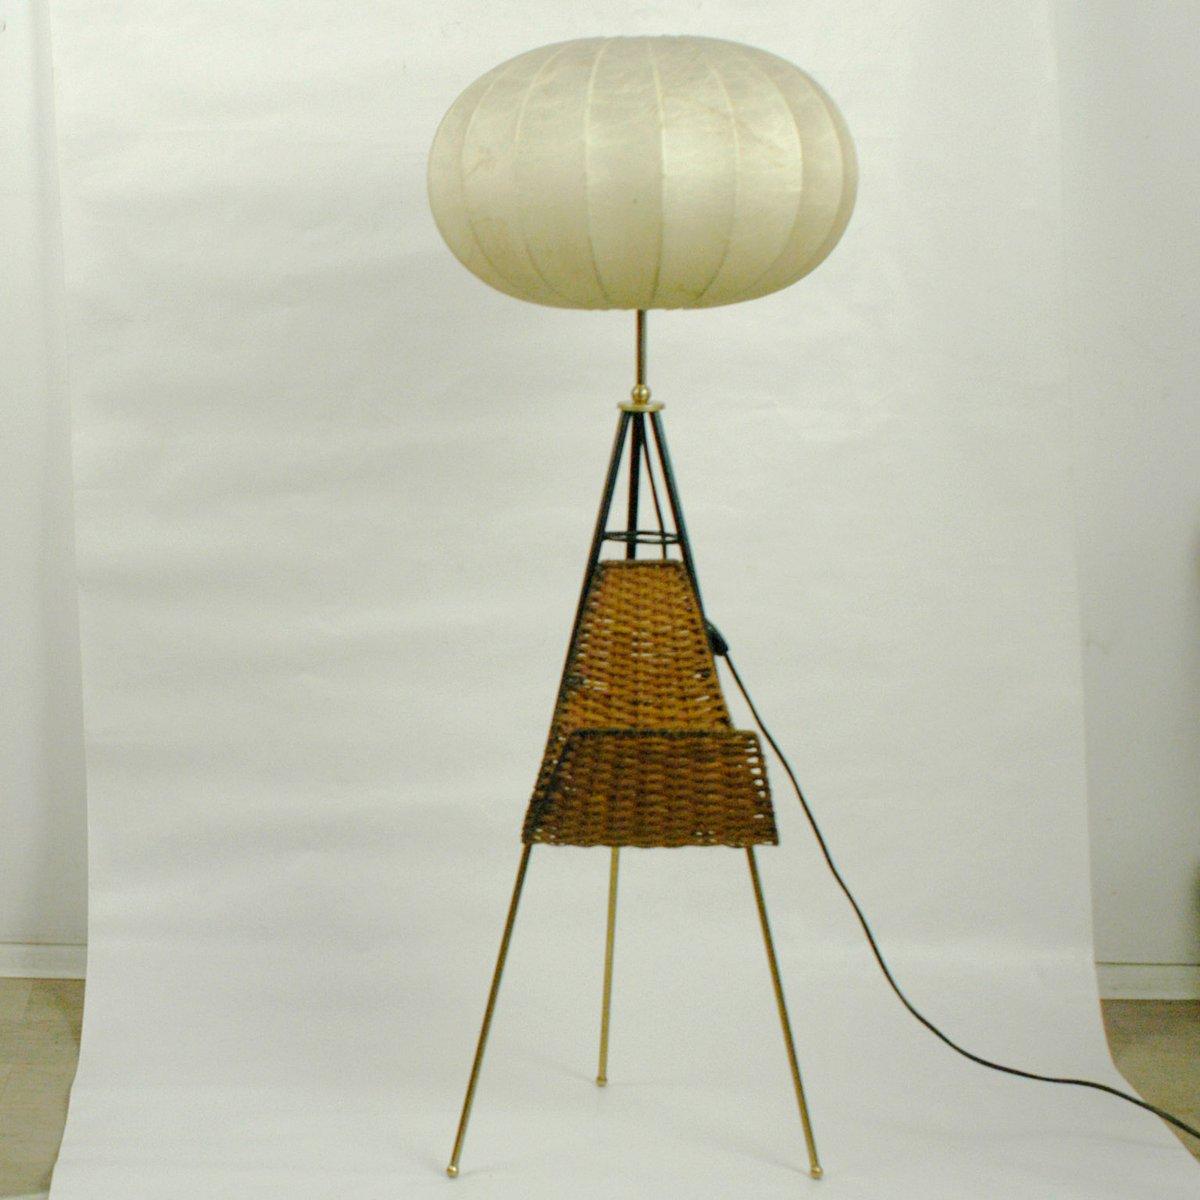 Italian Tripod Floor Lamp 1950s For Sale At Pamono